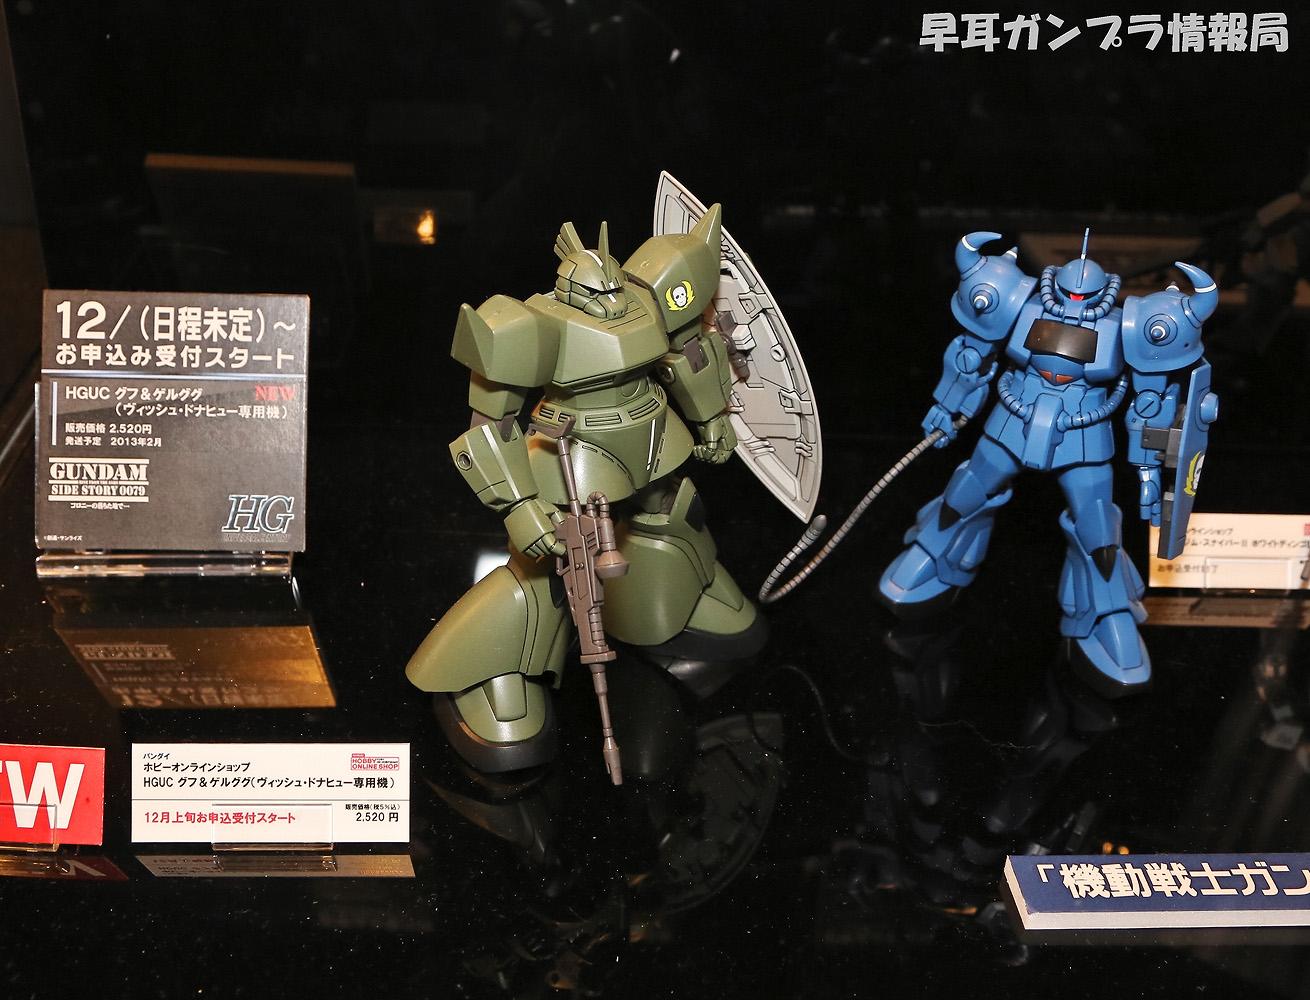 GUNDAM GUY P Bandai Hobby Online Shop Exclusive HGUC 1144 1310x1000